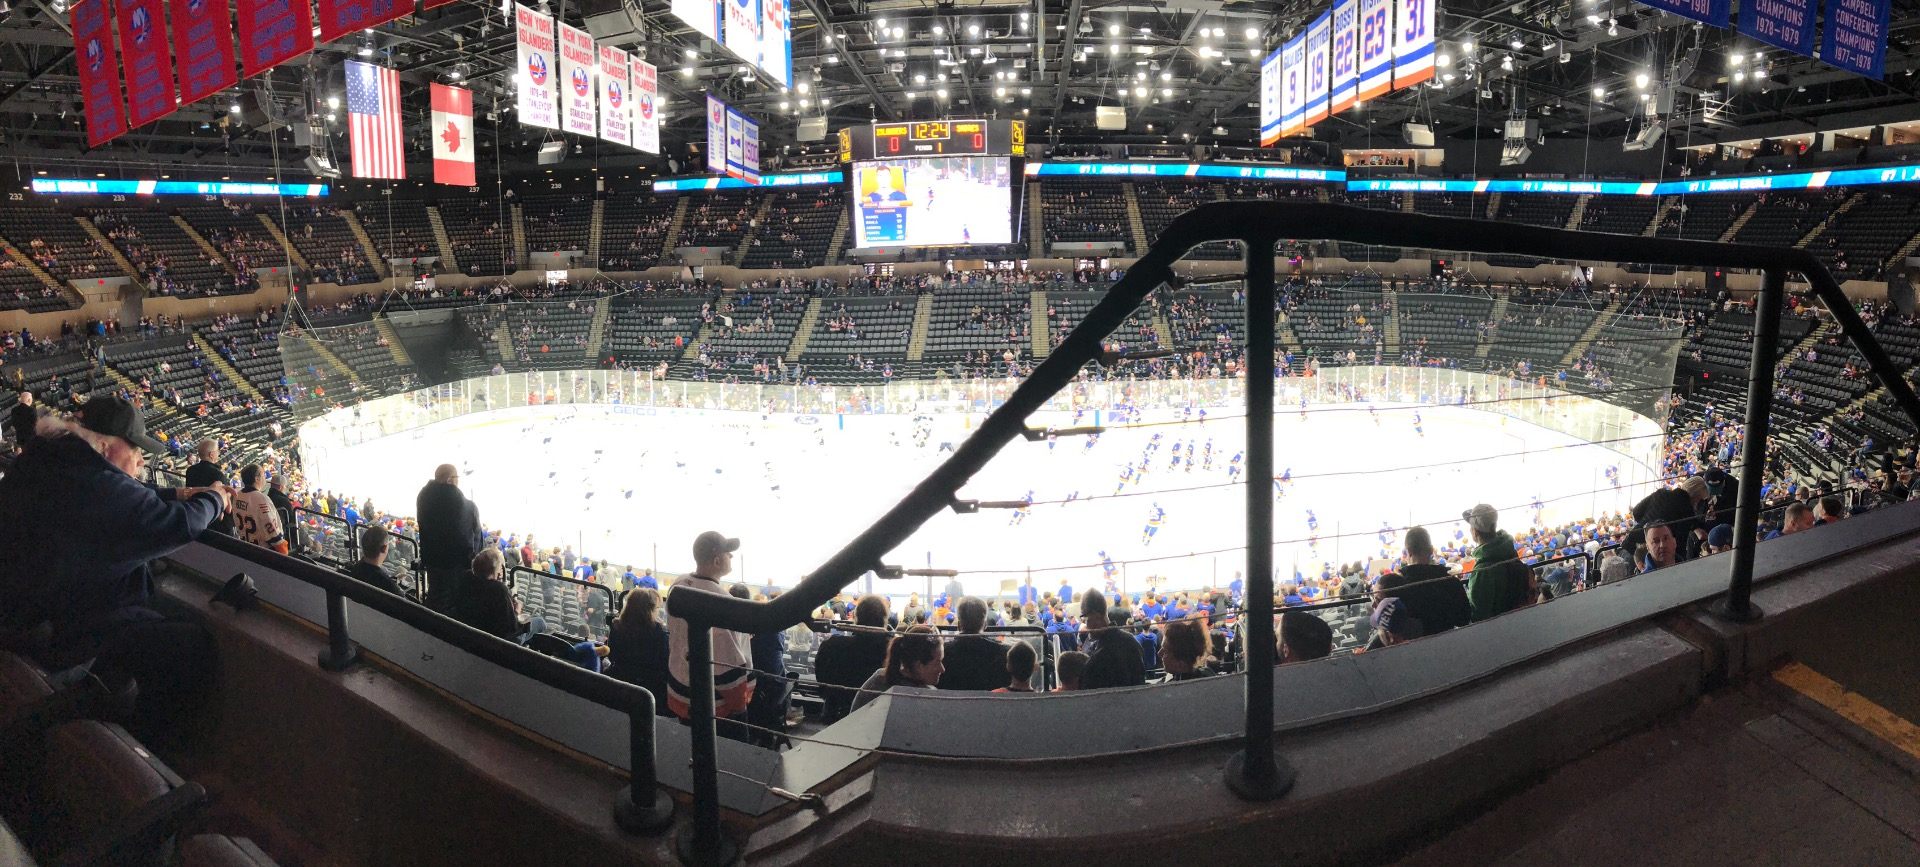 Nassau Veterans Memorial Coliseum Section 223 Row 2 Seat 1